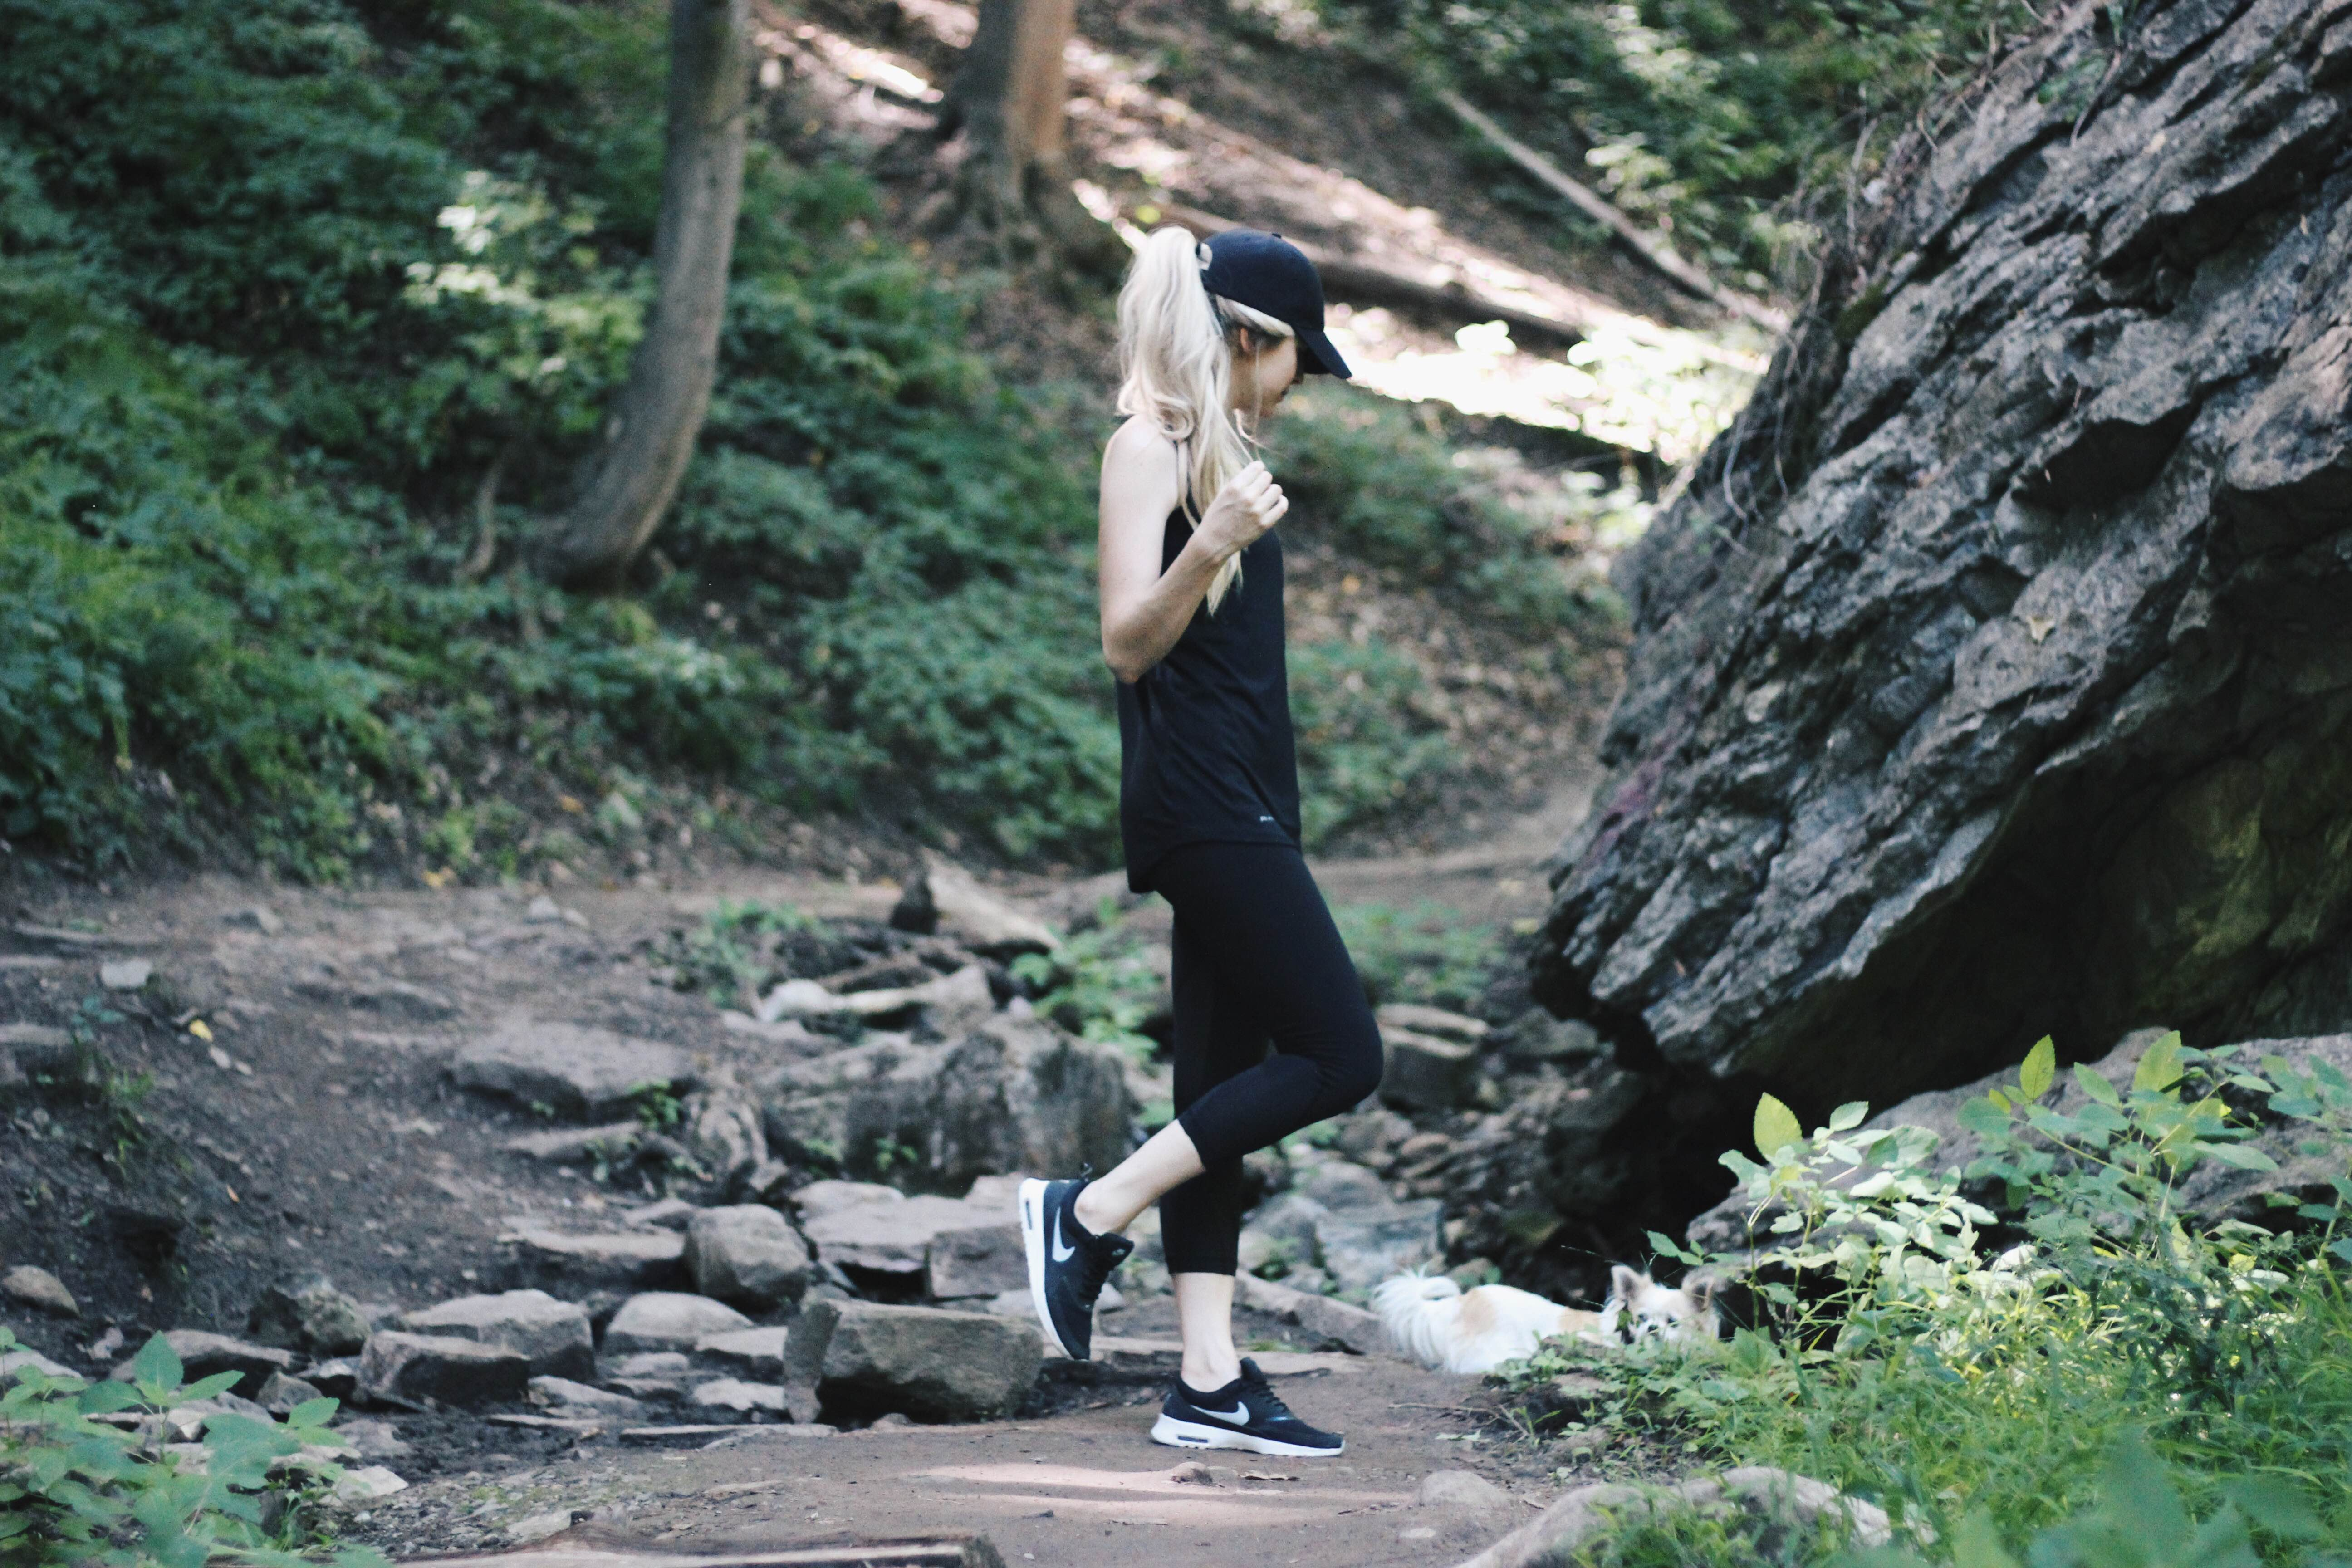 Perfect Hiking Outfit, Niagara Glen - Niagara Falls, Alex Gaboury